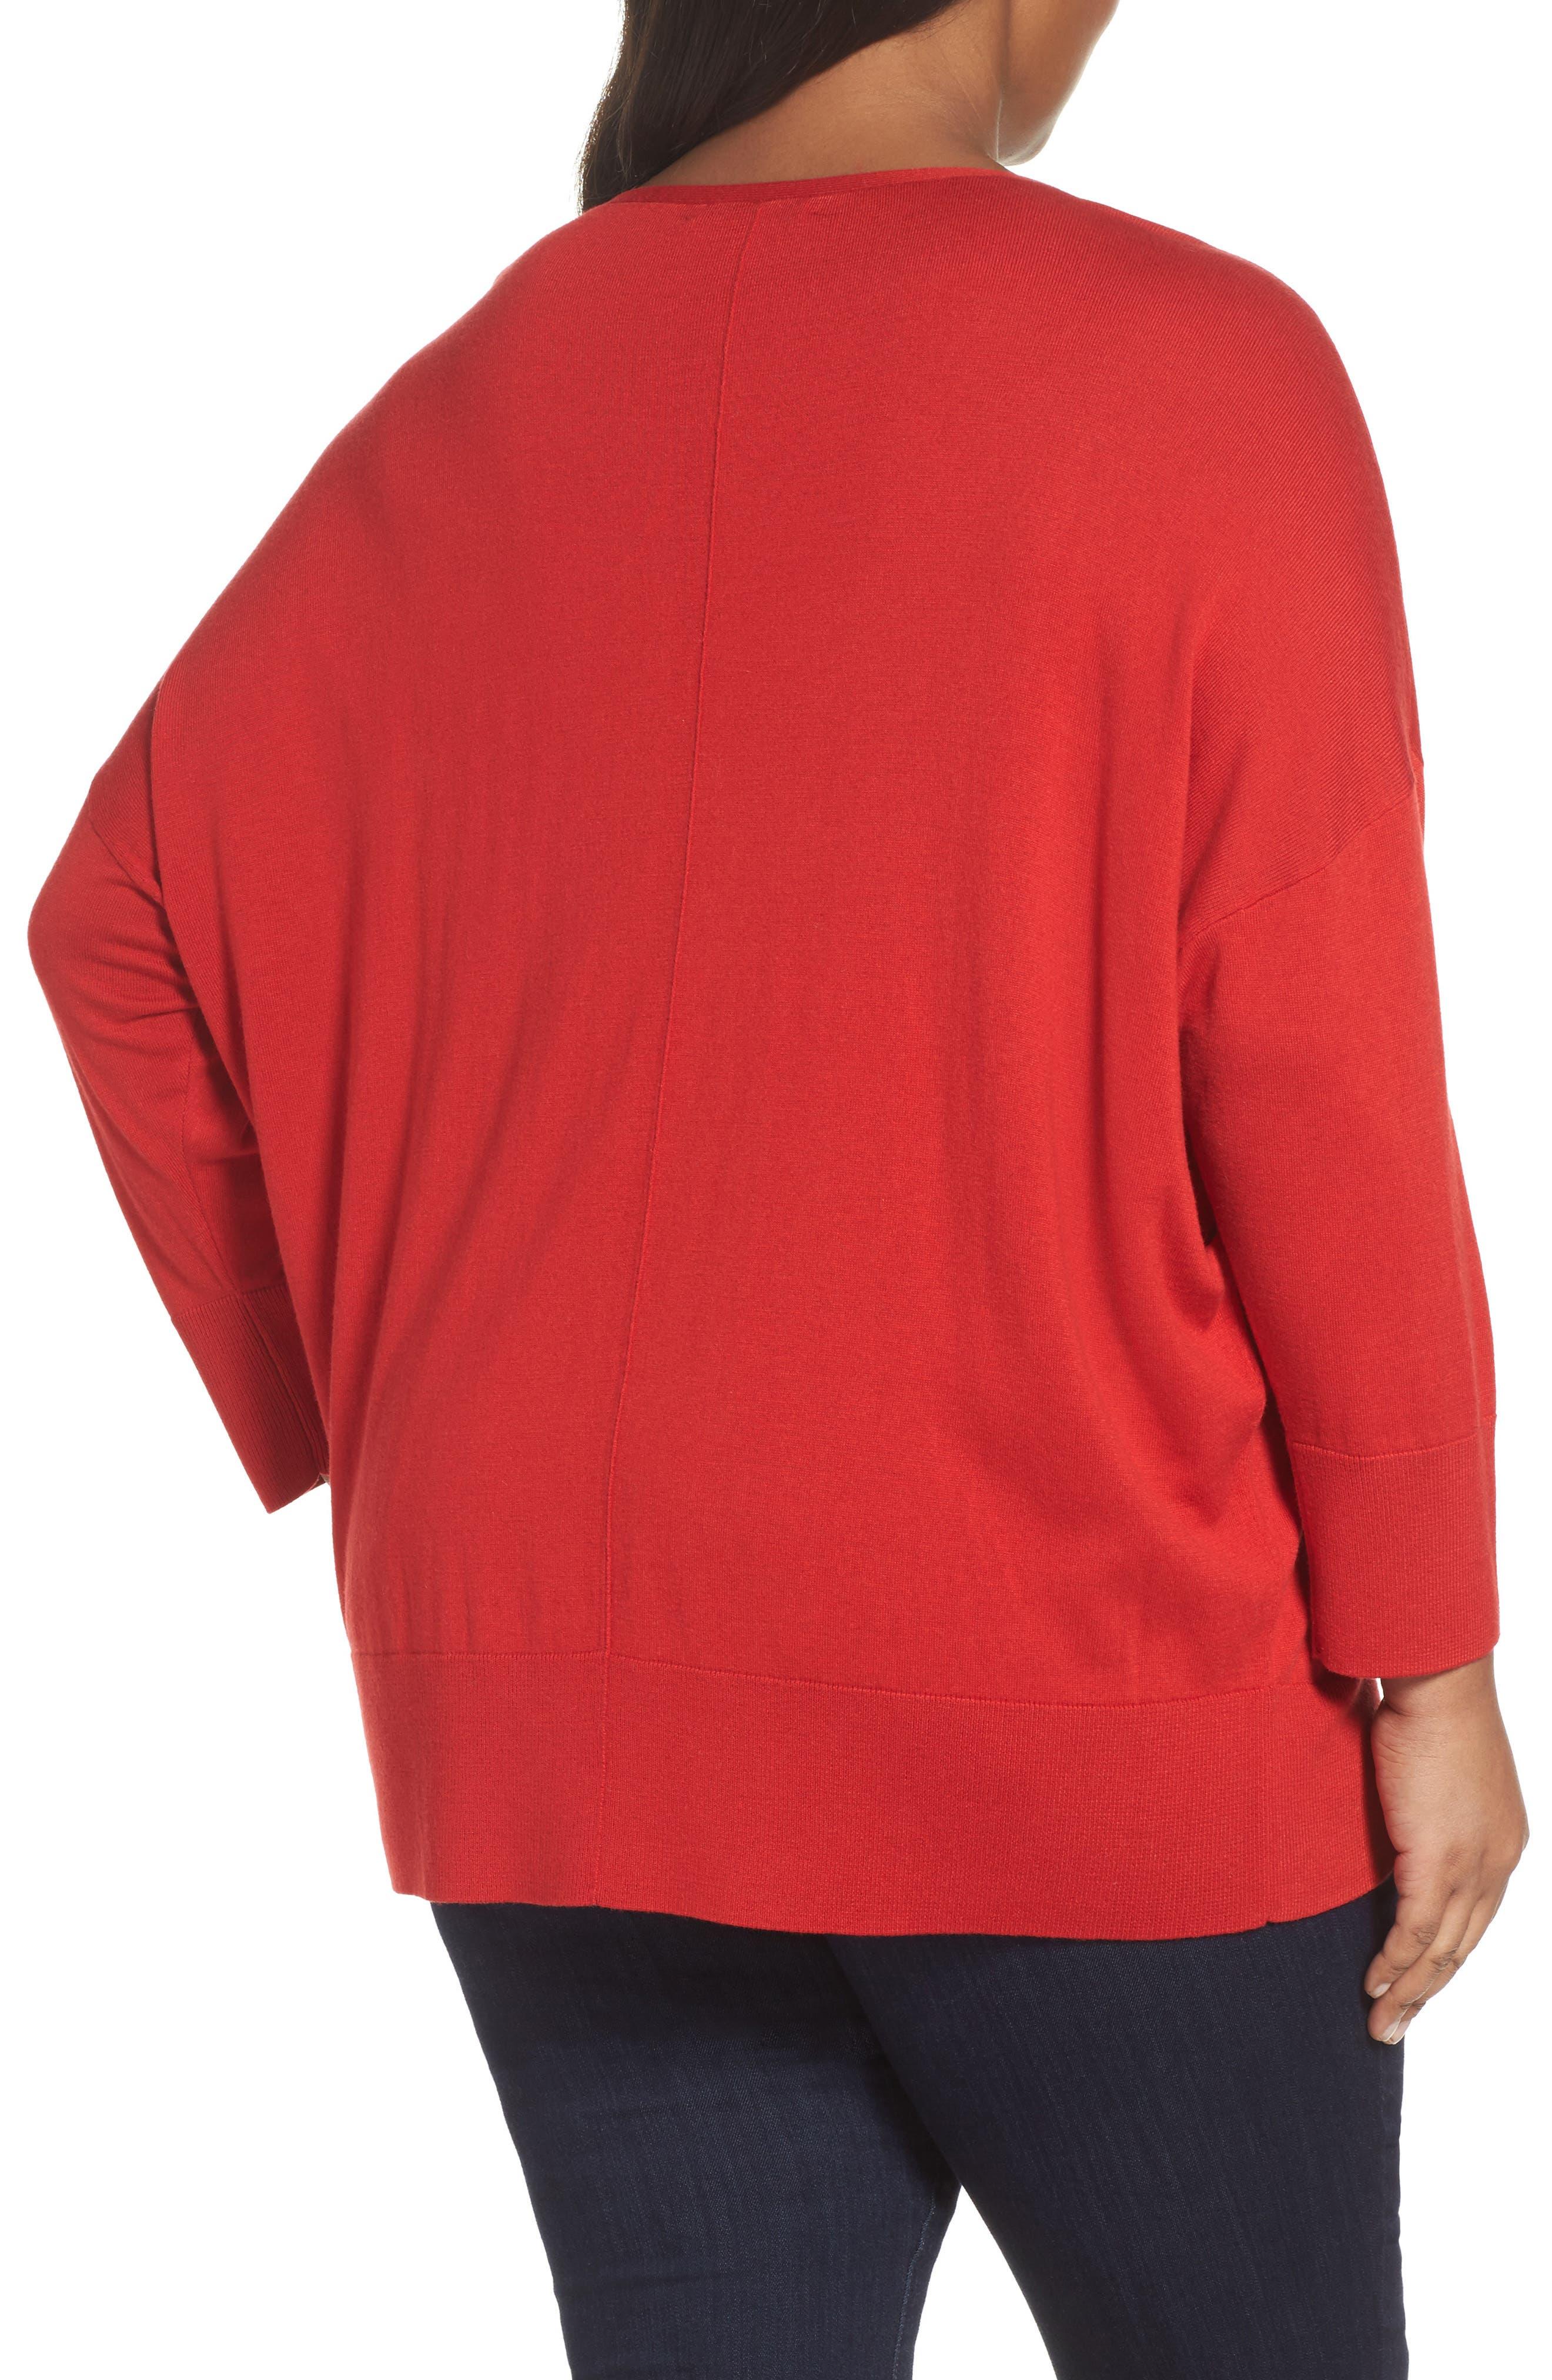 Dolman Sleeve Sweater,                             Alternate thumbnail 6, color,